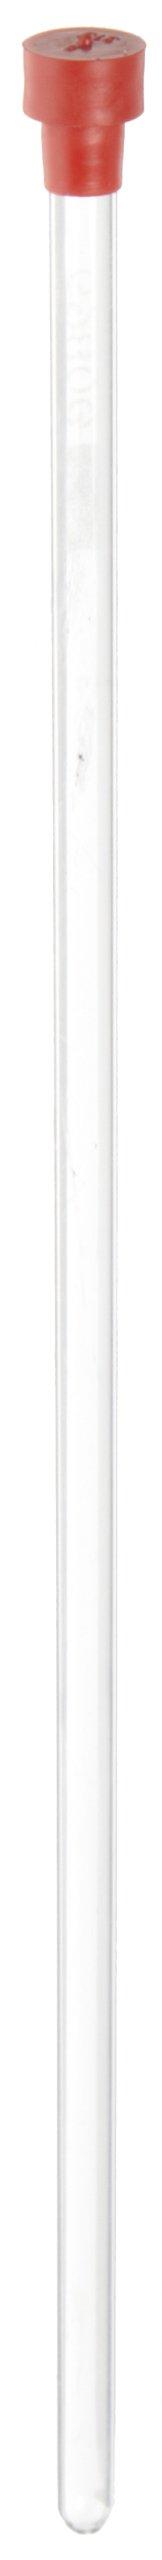 Corning Pyrex Borosilicate Glass 60MHz Basic NMR Tubes, 5mm O.D x 8'' Length (Case of 10) by Pyrex (Image #1)